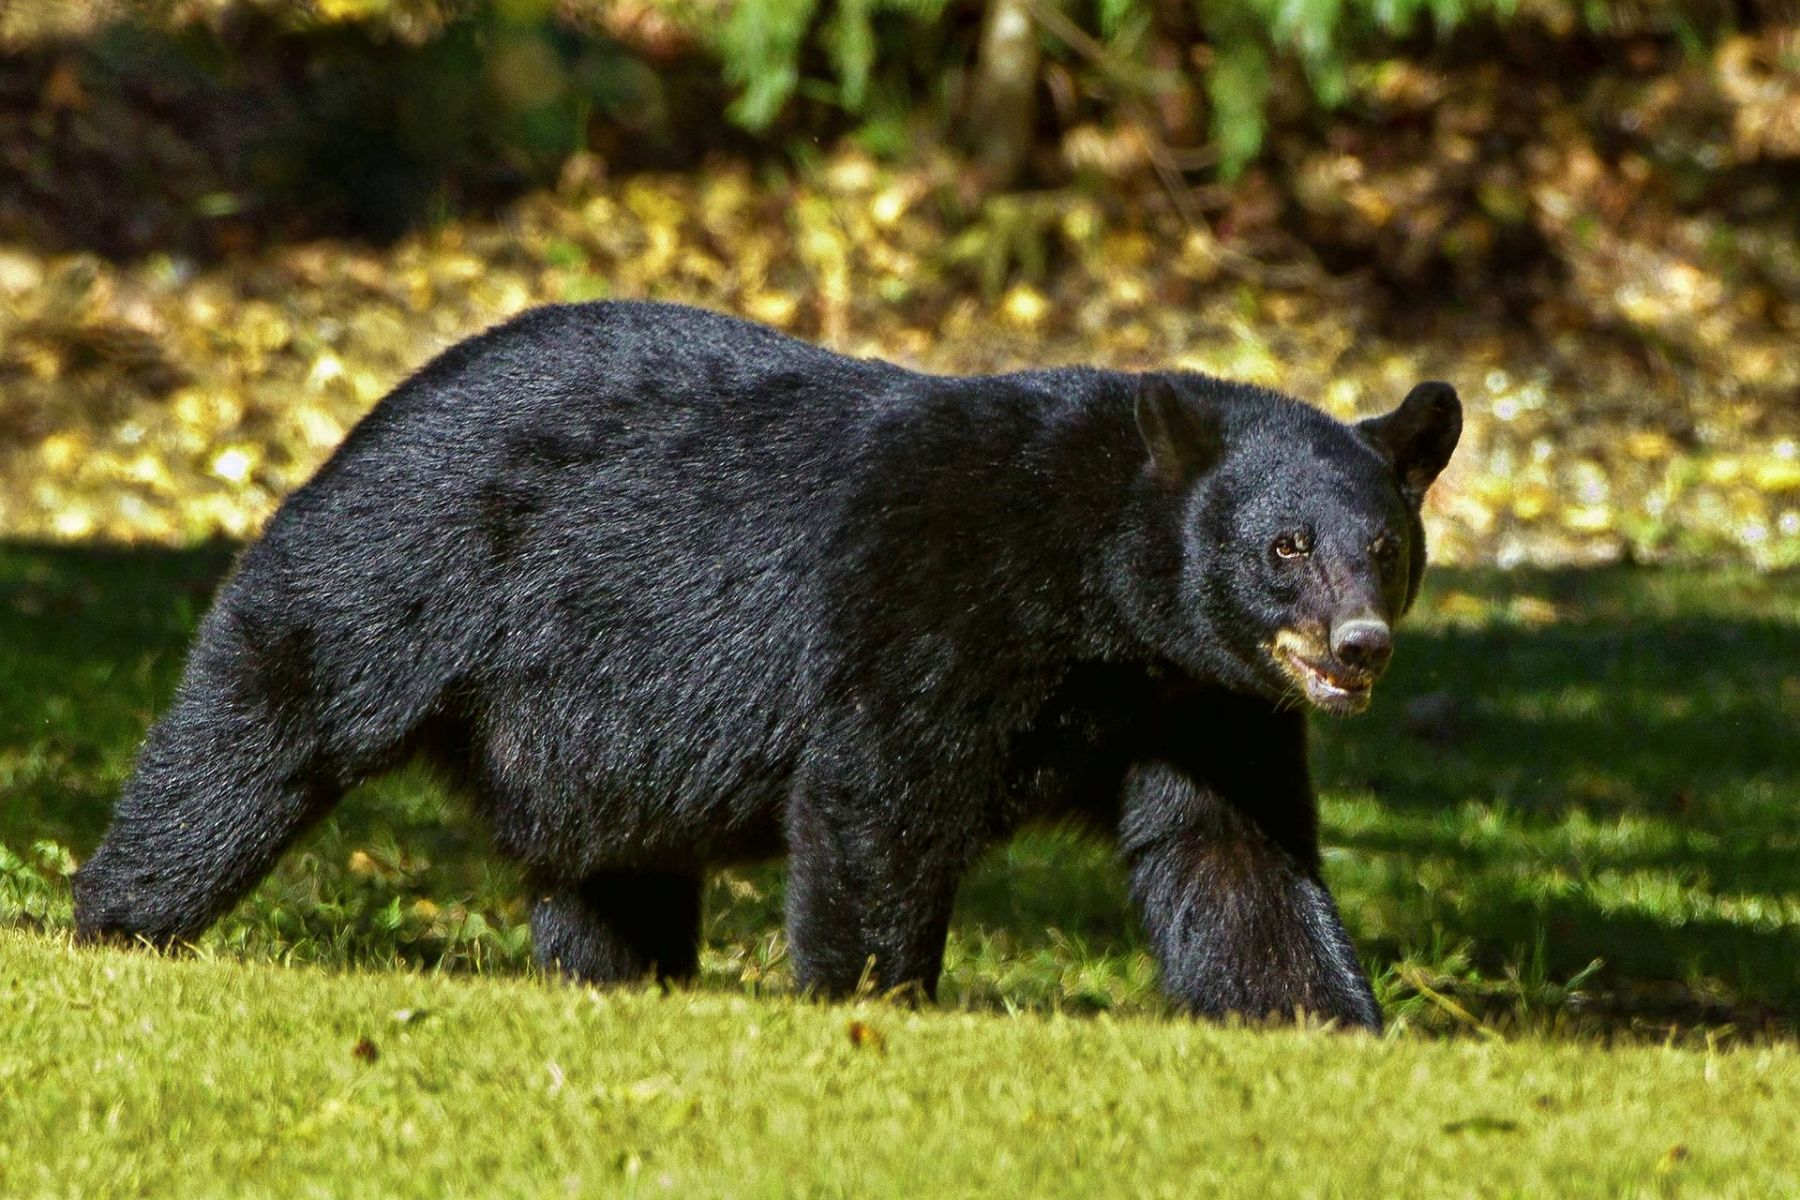 Louisiana black bear not endangered